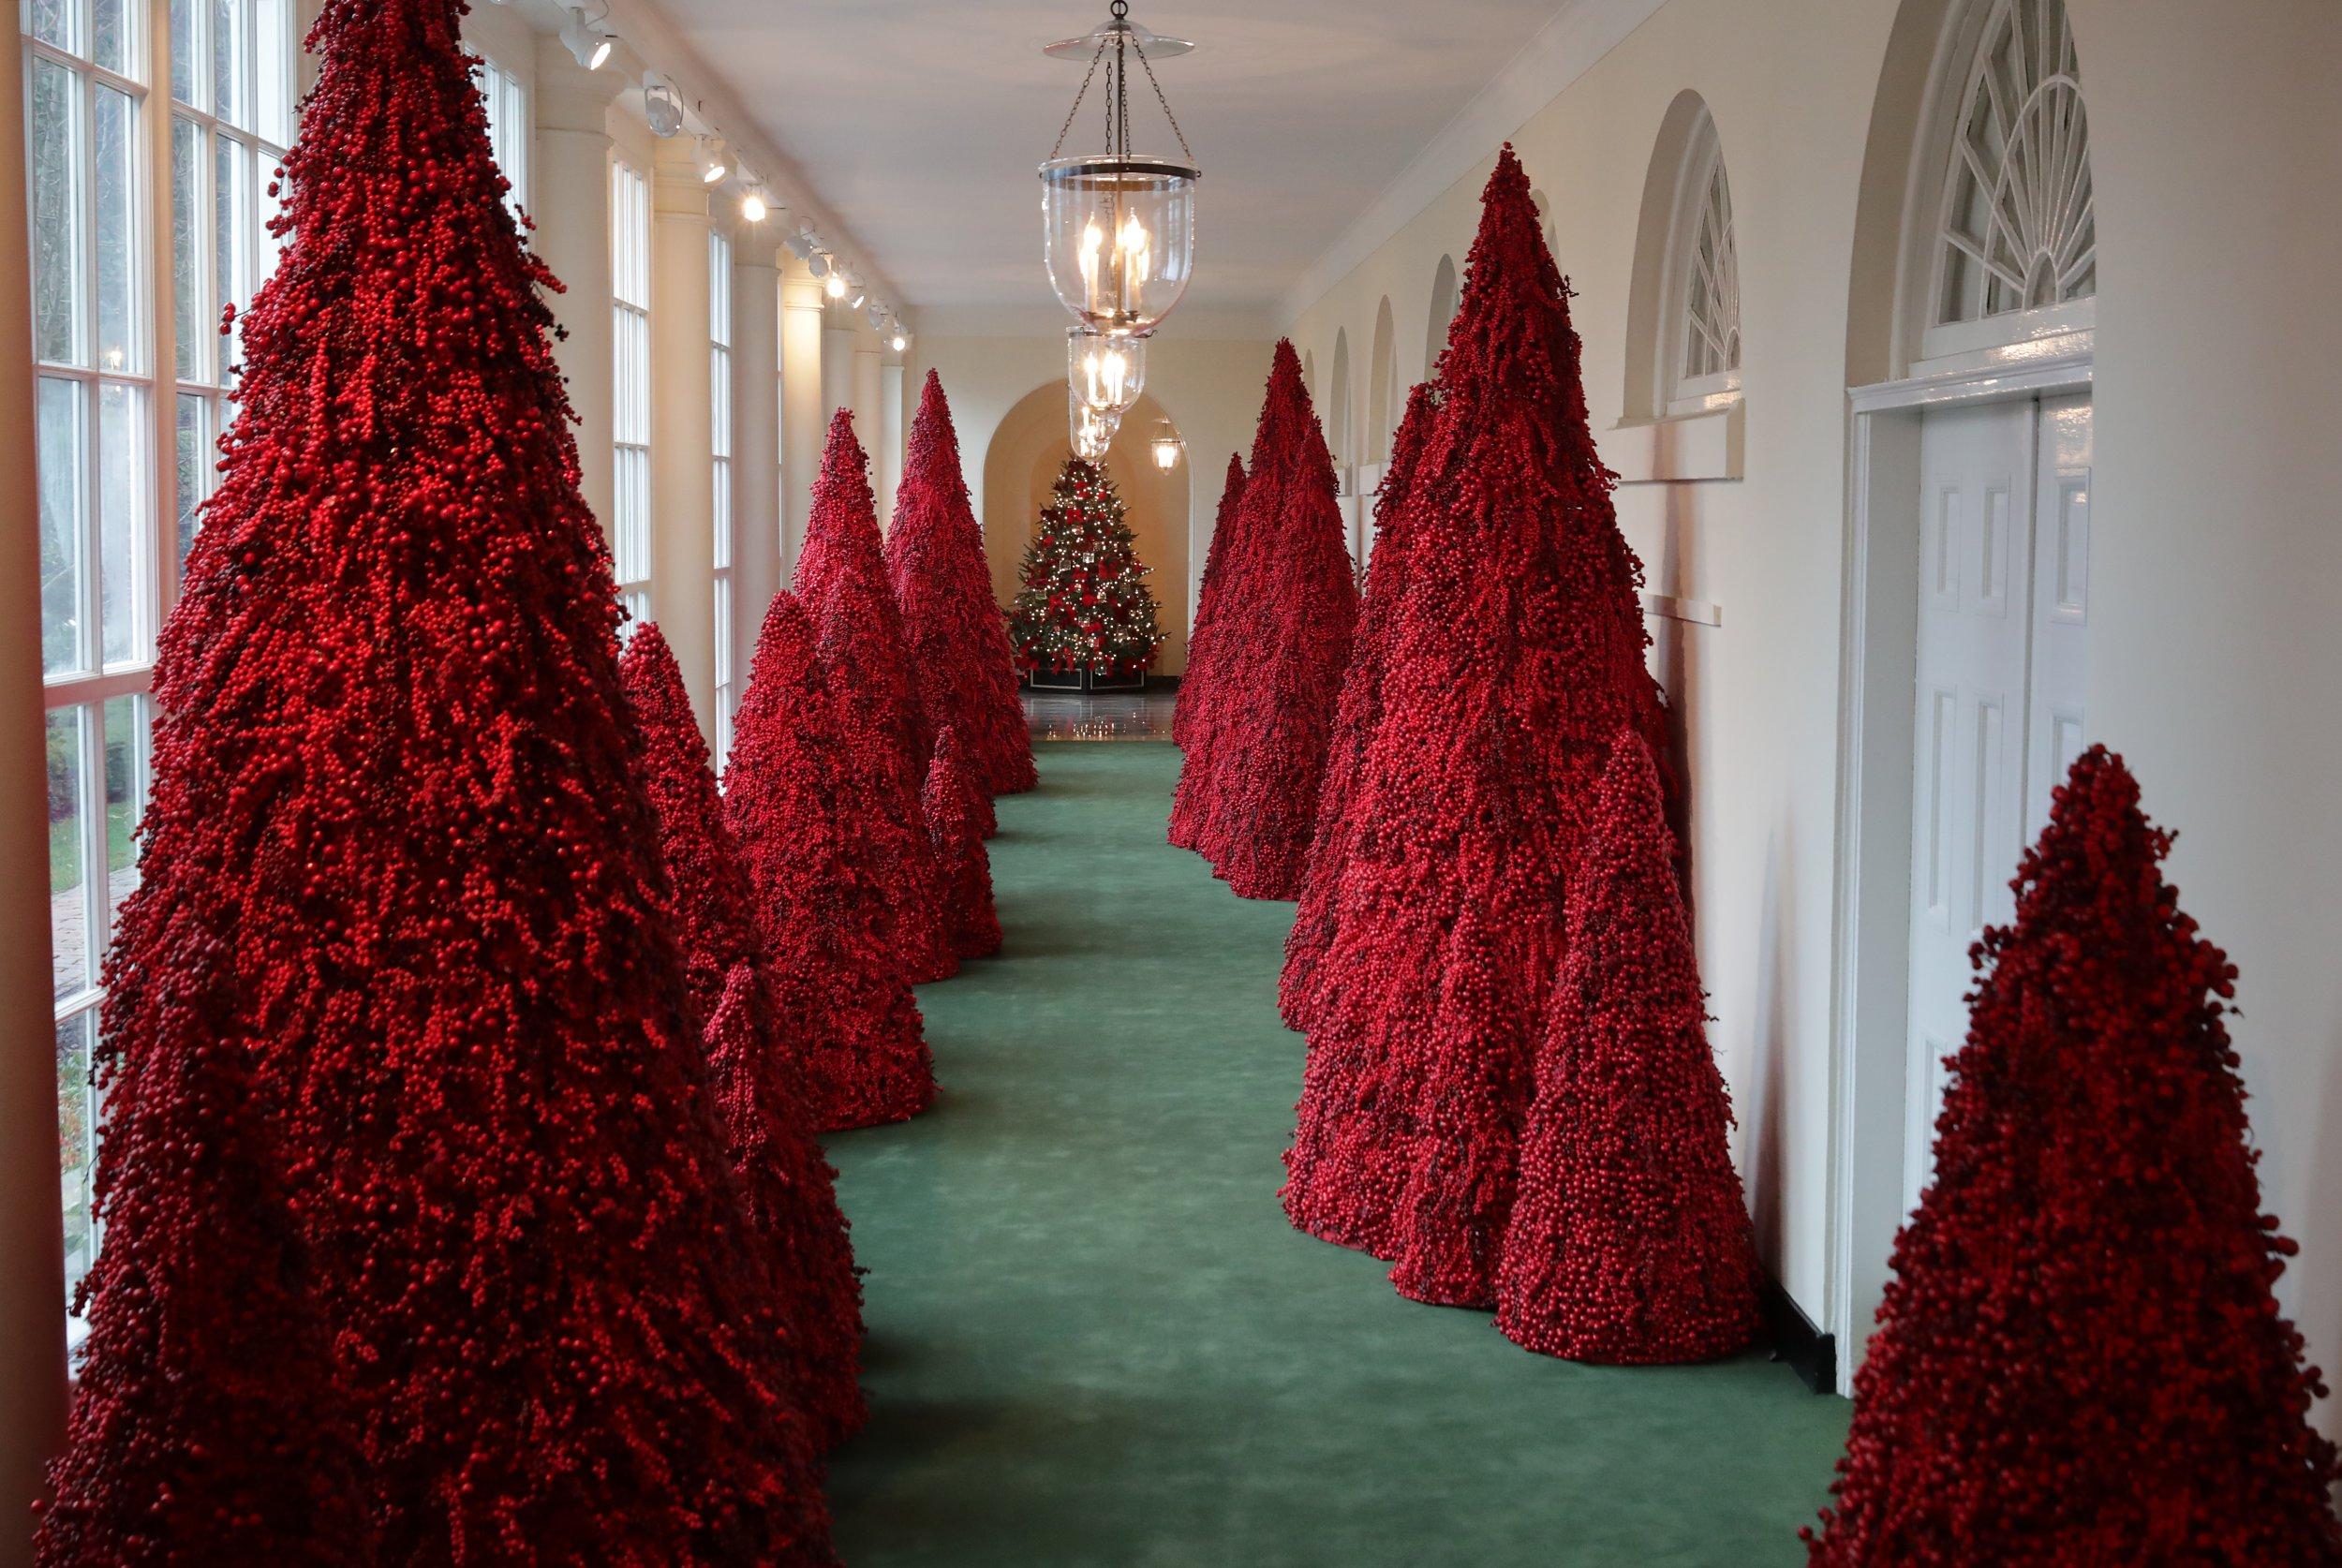 melania trump red trees christmas white house